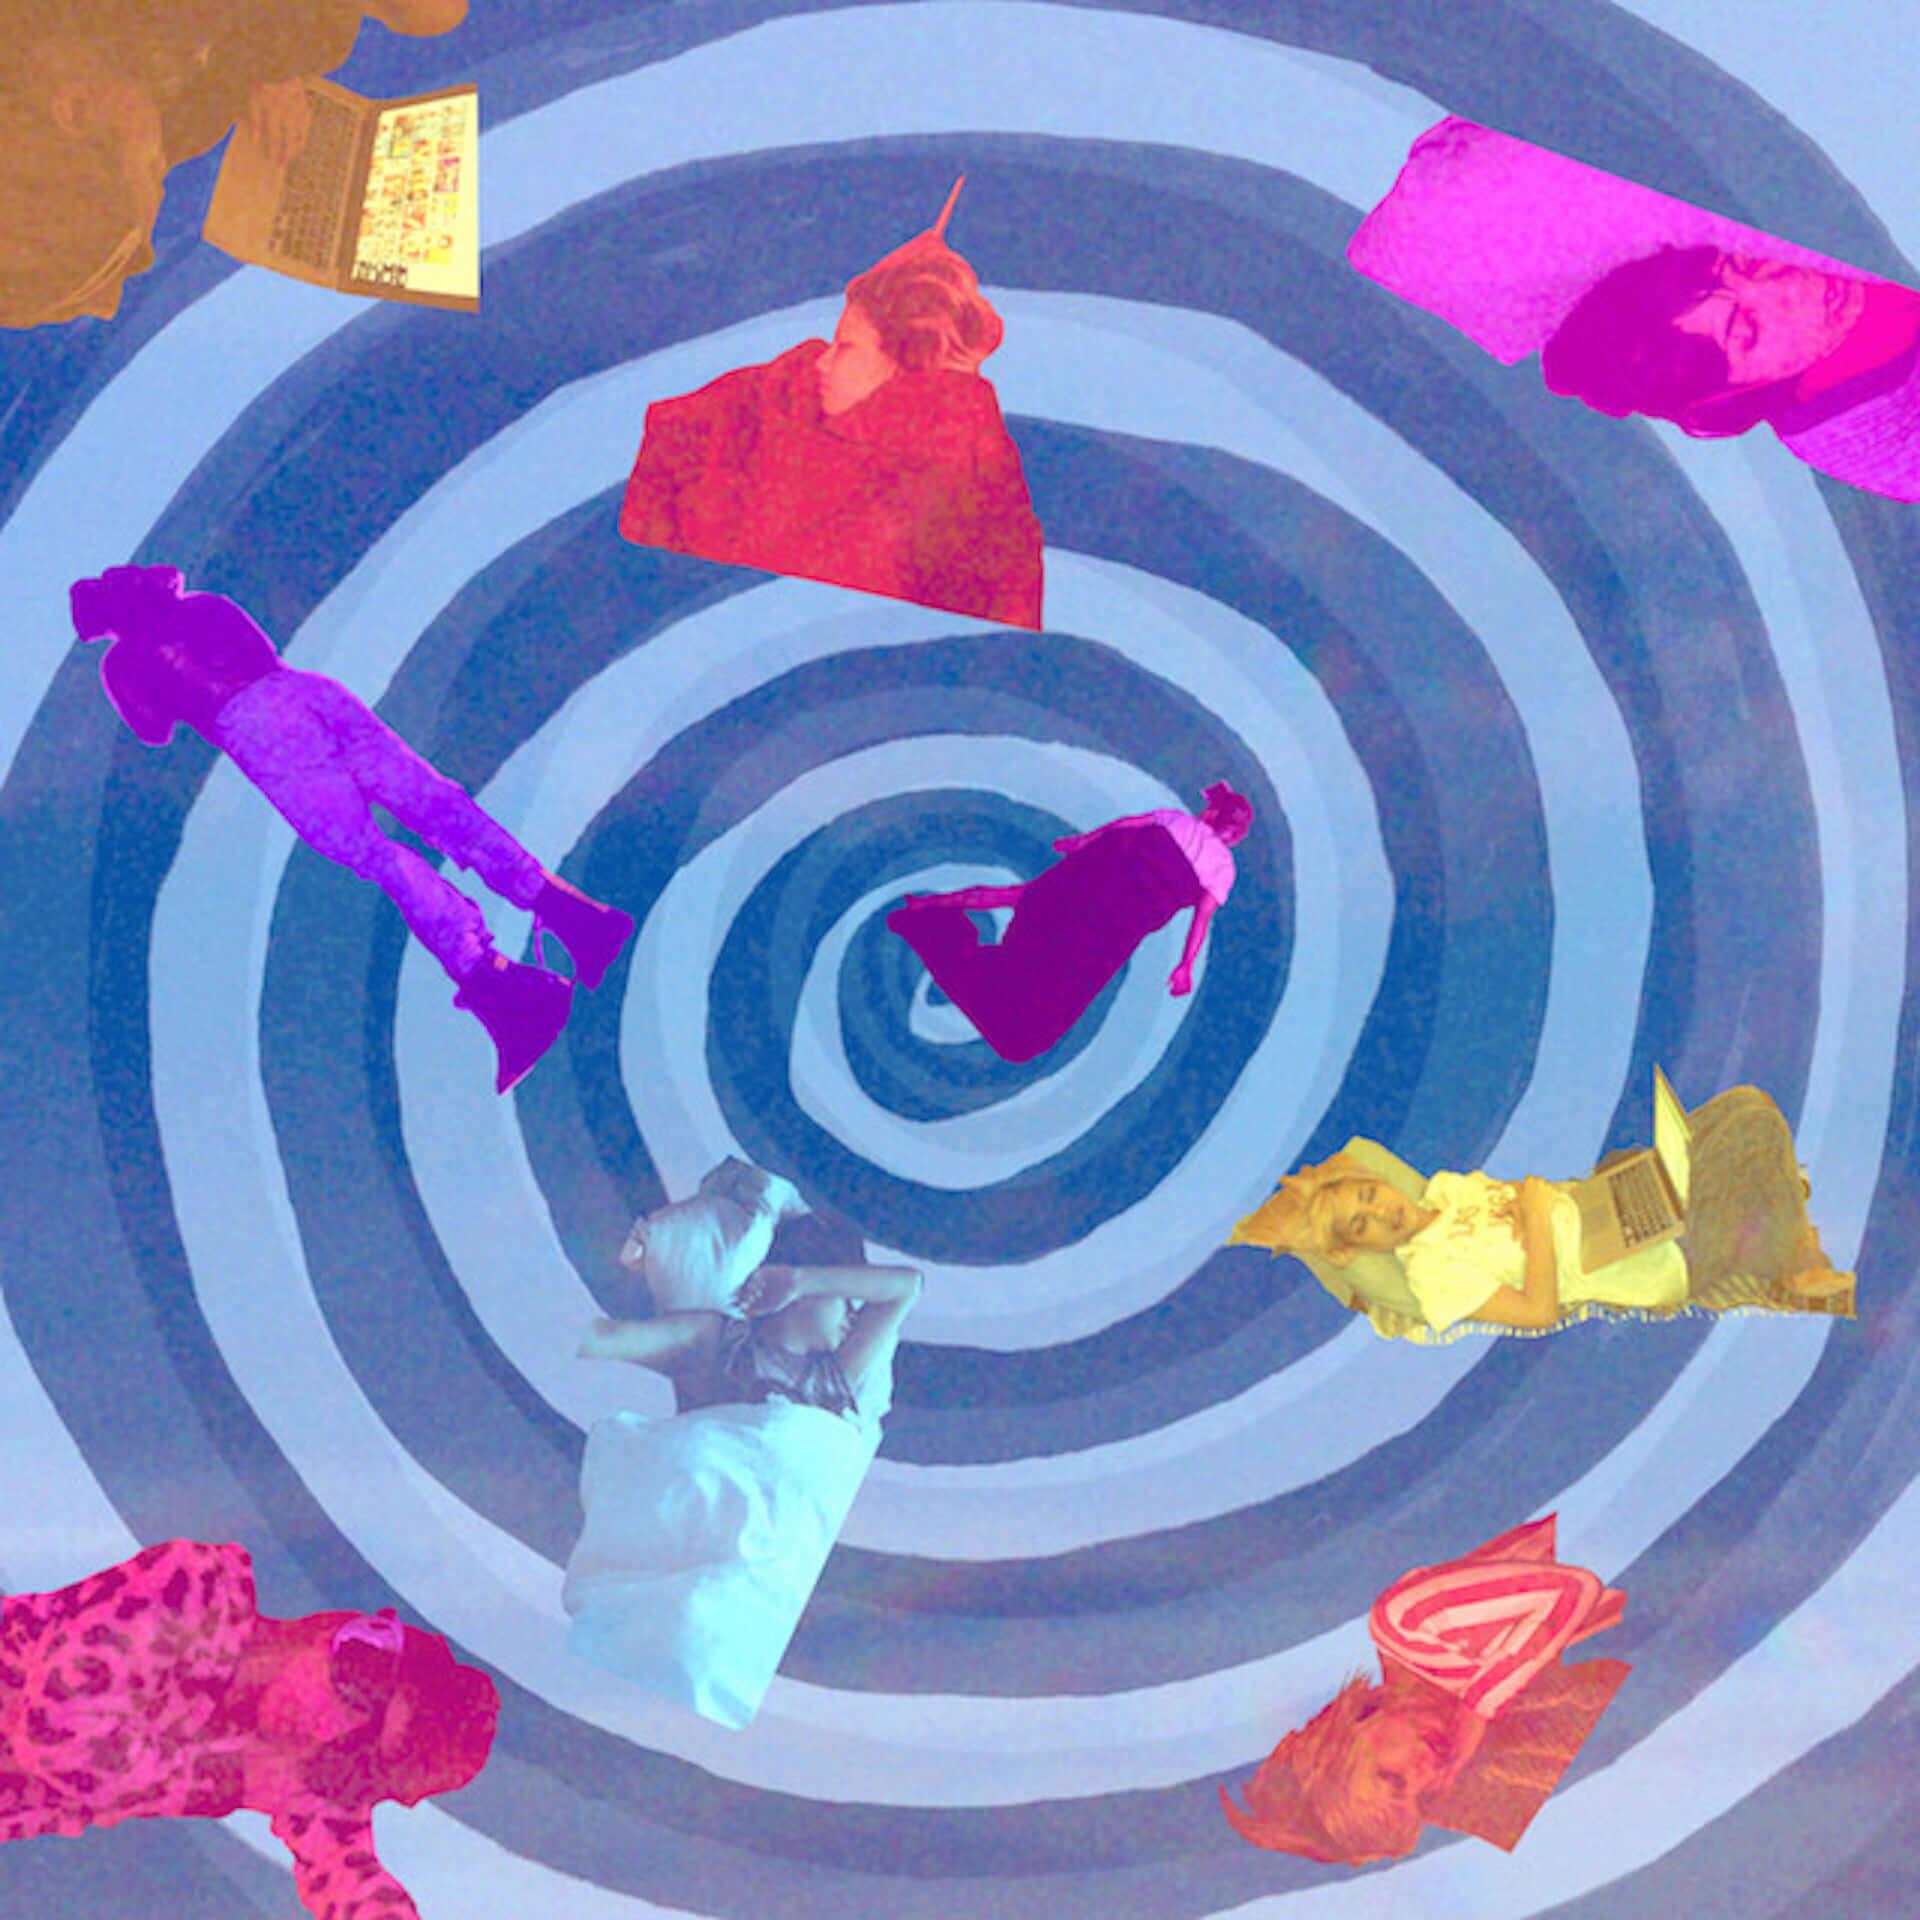 Louis Coleとのユニット・KNOWERでも知られるGenevieve Artadiの新作が〈Brainfeeder〉からリリース決定!新曲のMVも公開 music200528_genevieve_artadi_2-1920x1920